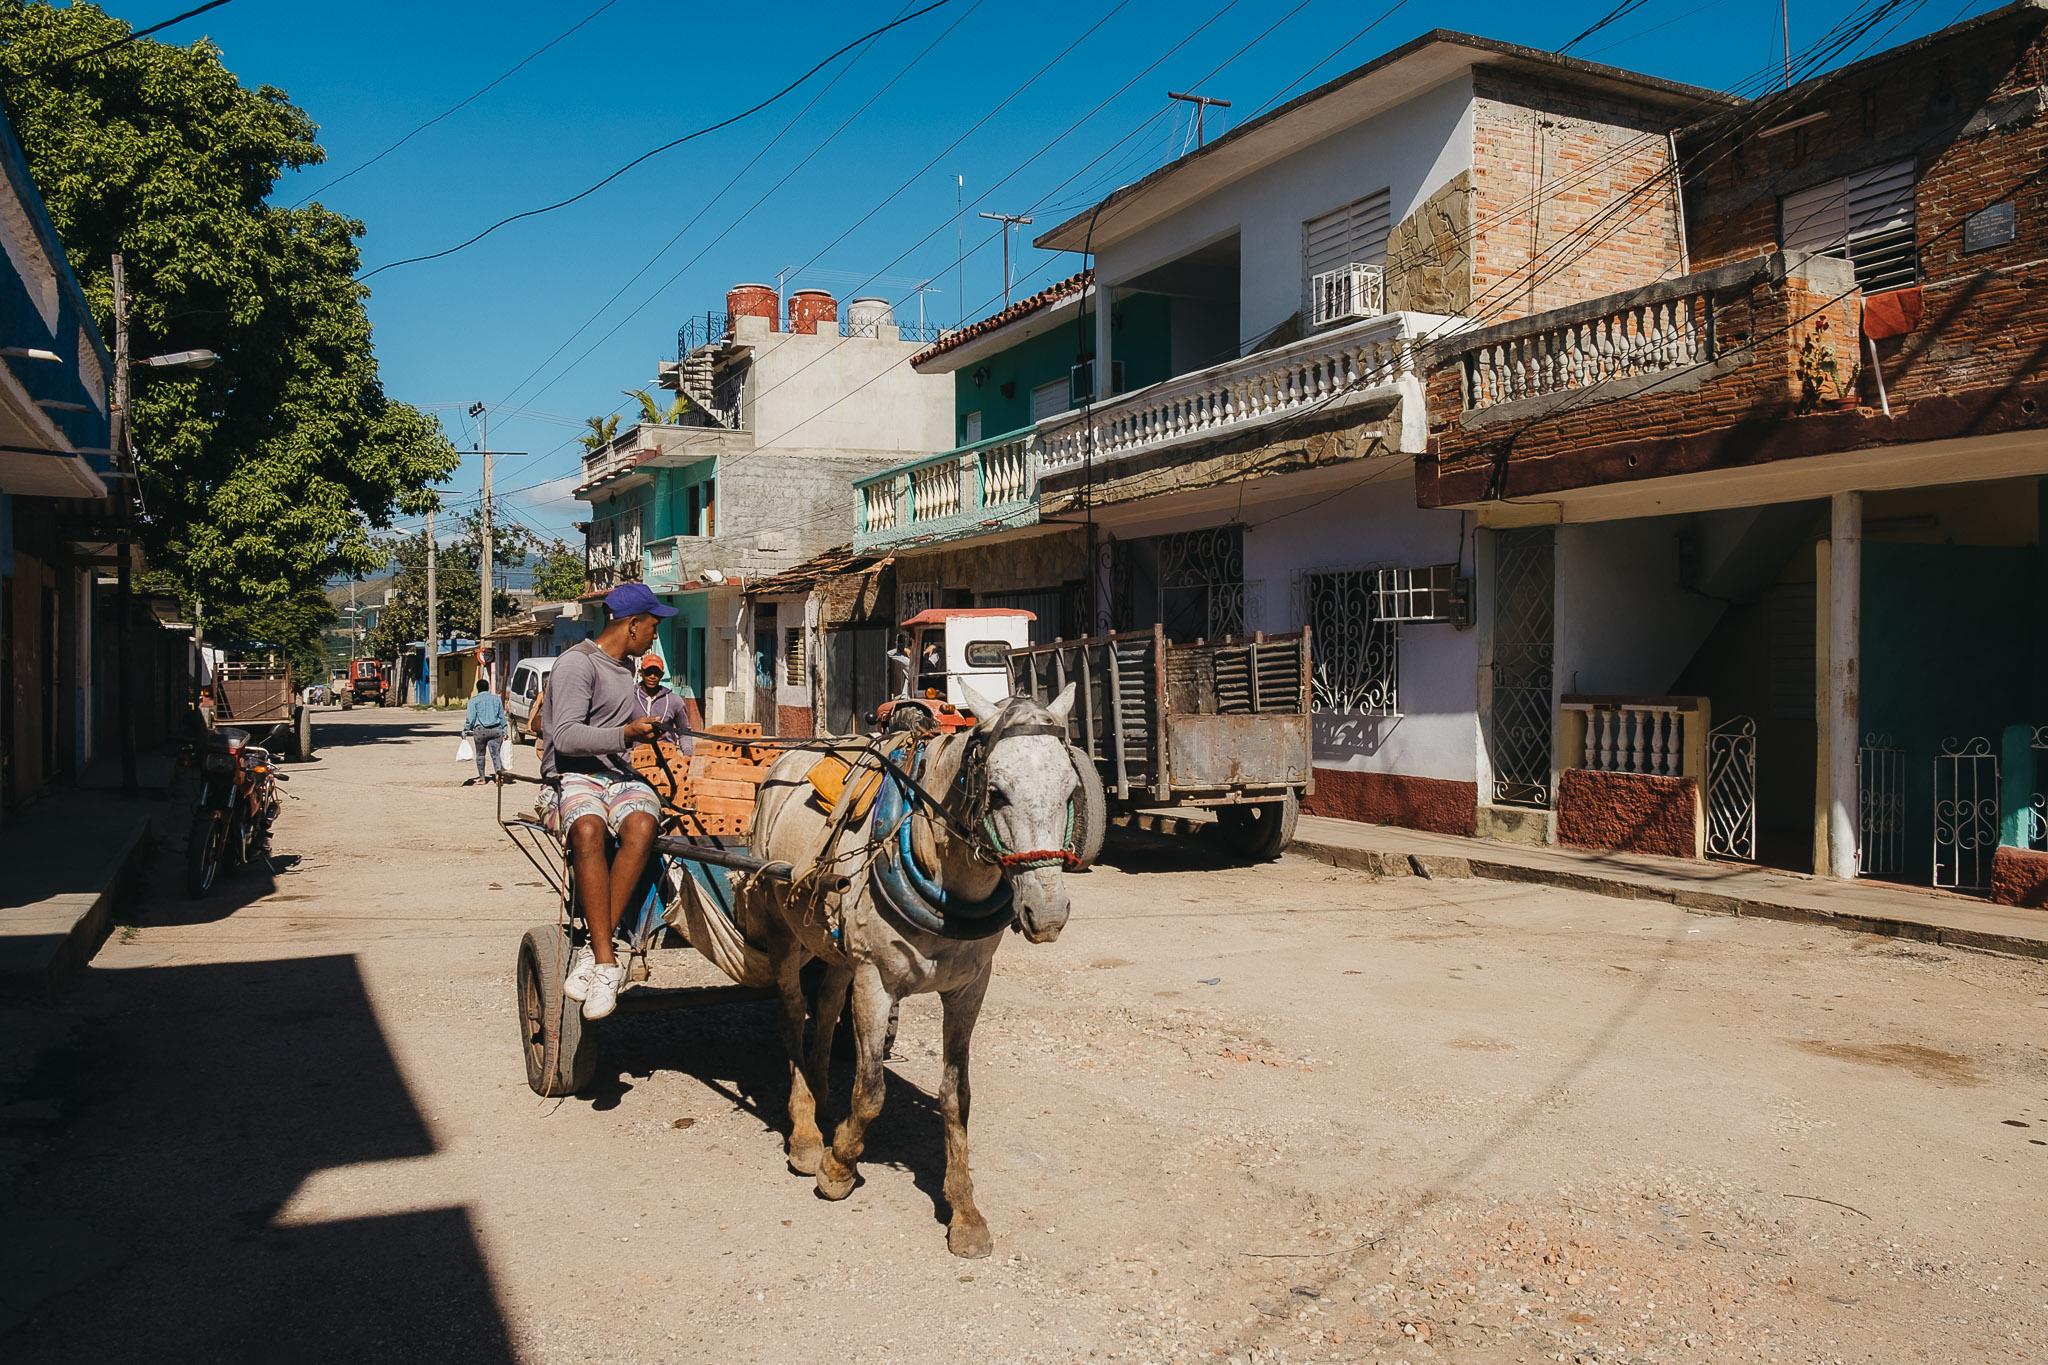 Cuba-2017-12-Trinidad-0003.jpg